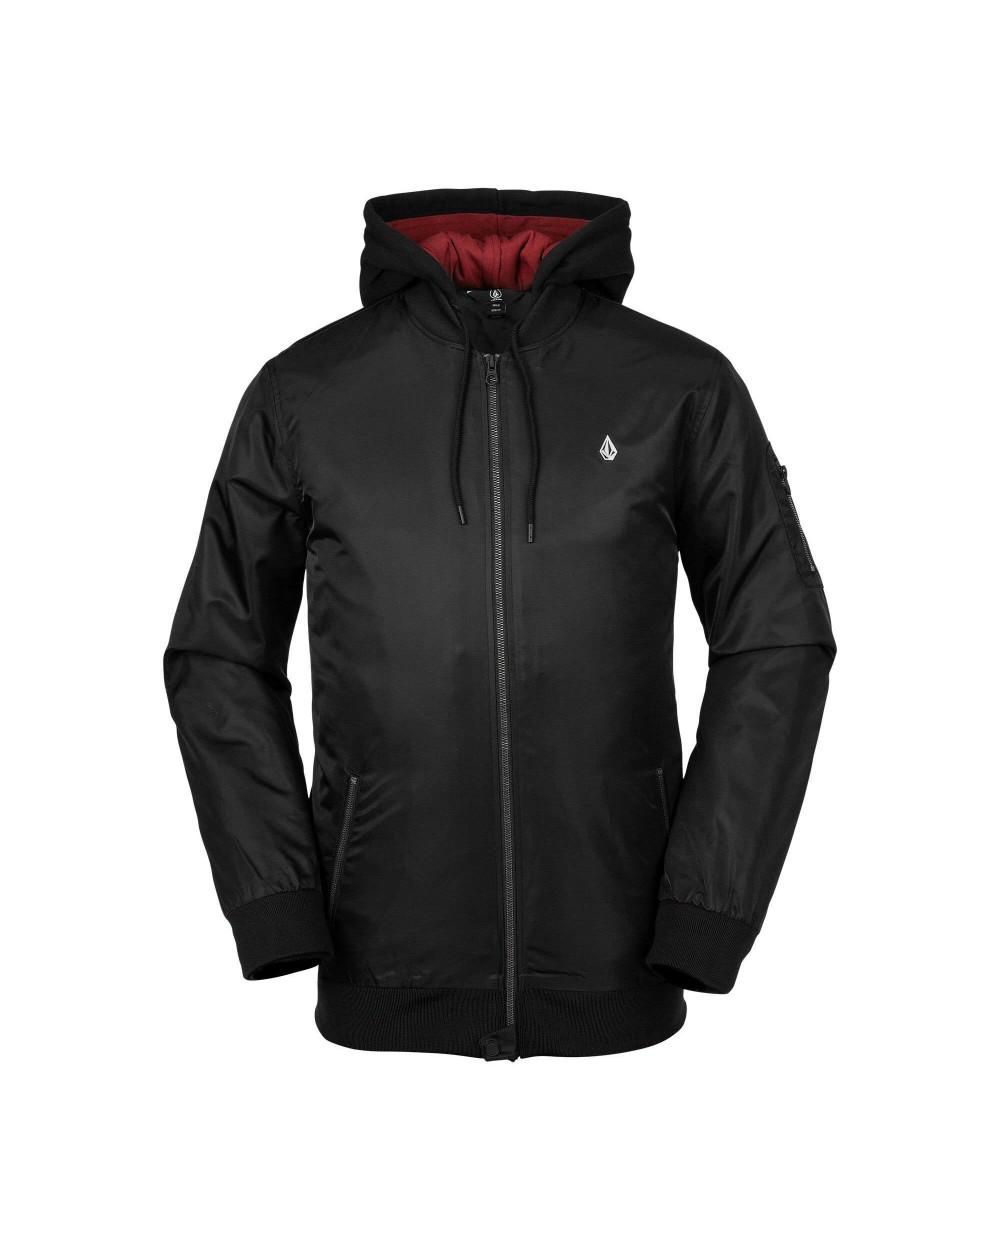 Volcom Snow Cheyne 3-in-1 Jacket - Black